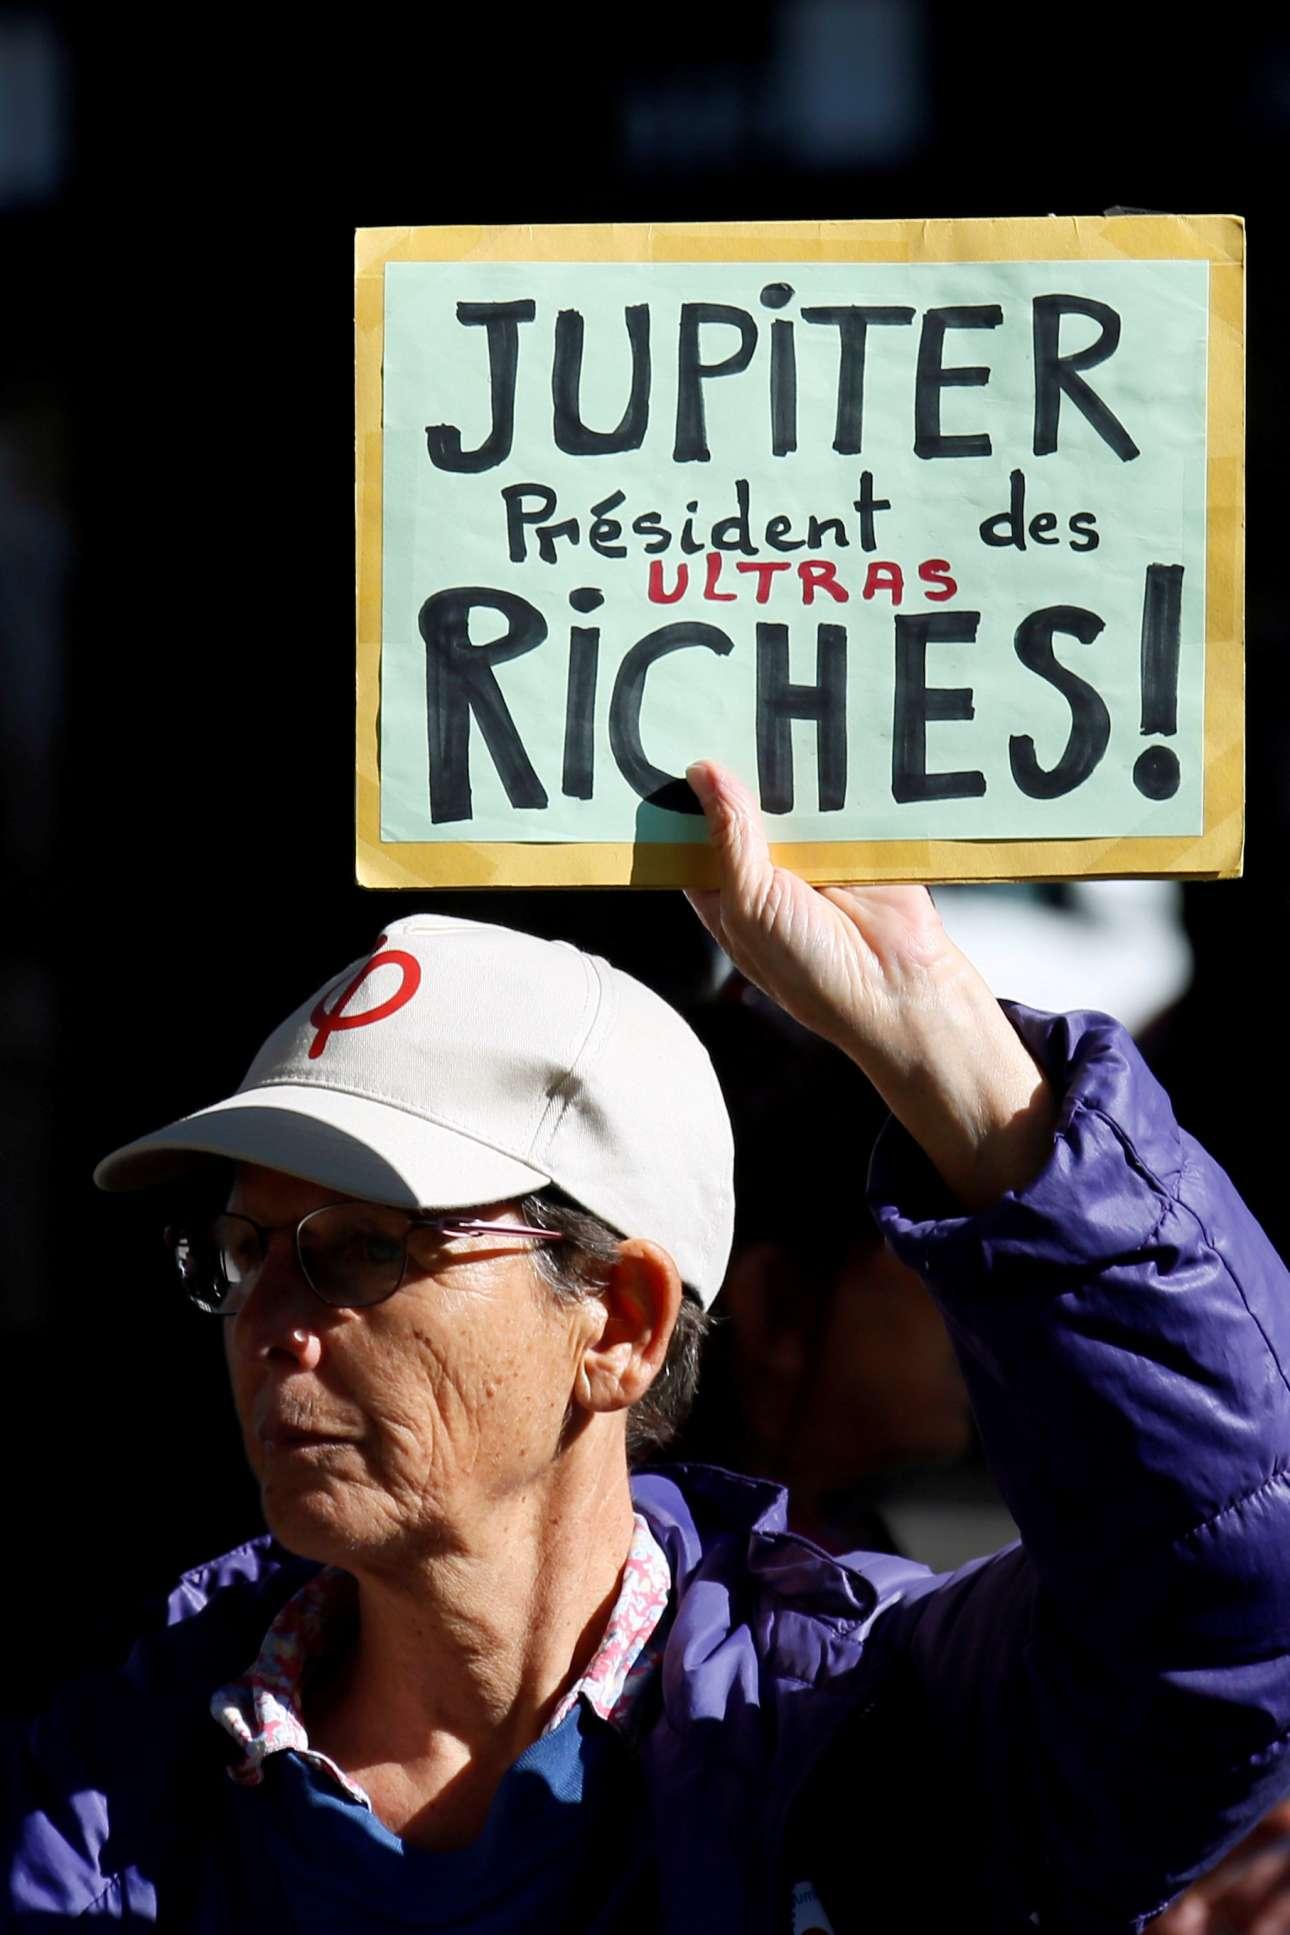 REUTERS/ Robert Pratta/ File Photo